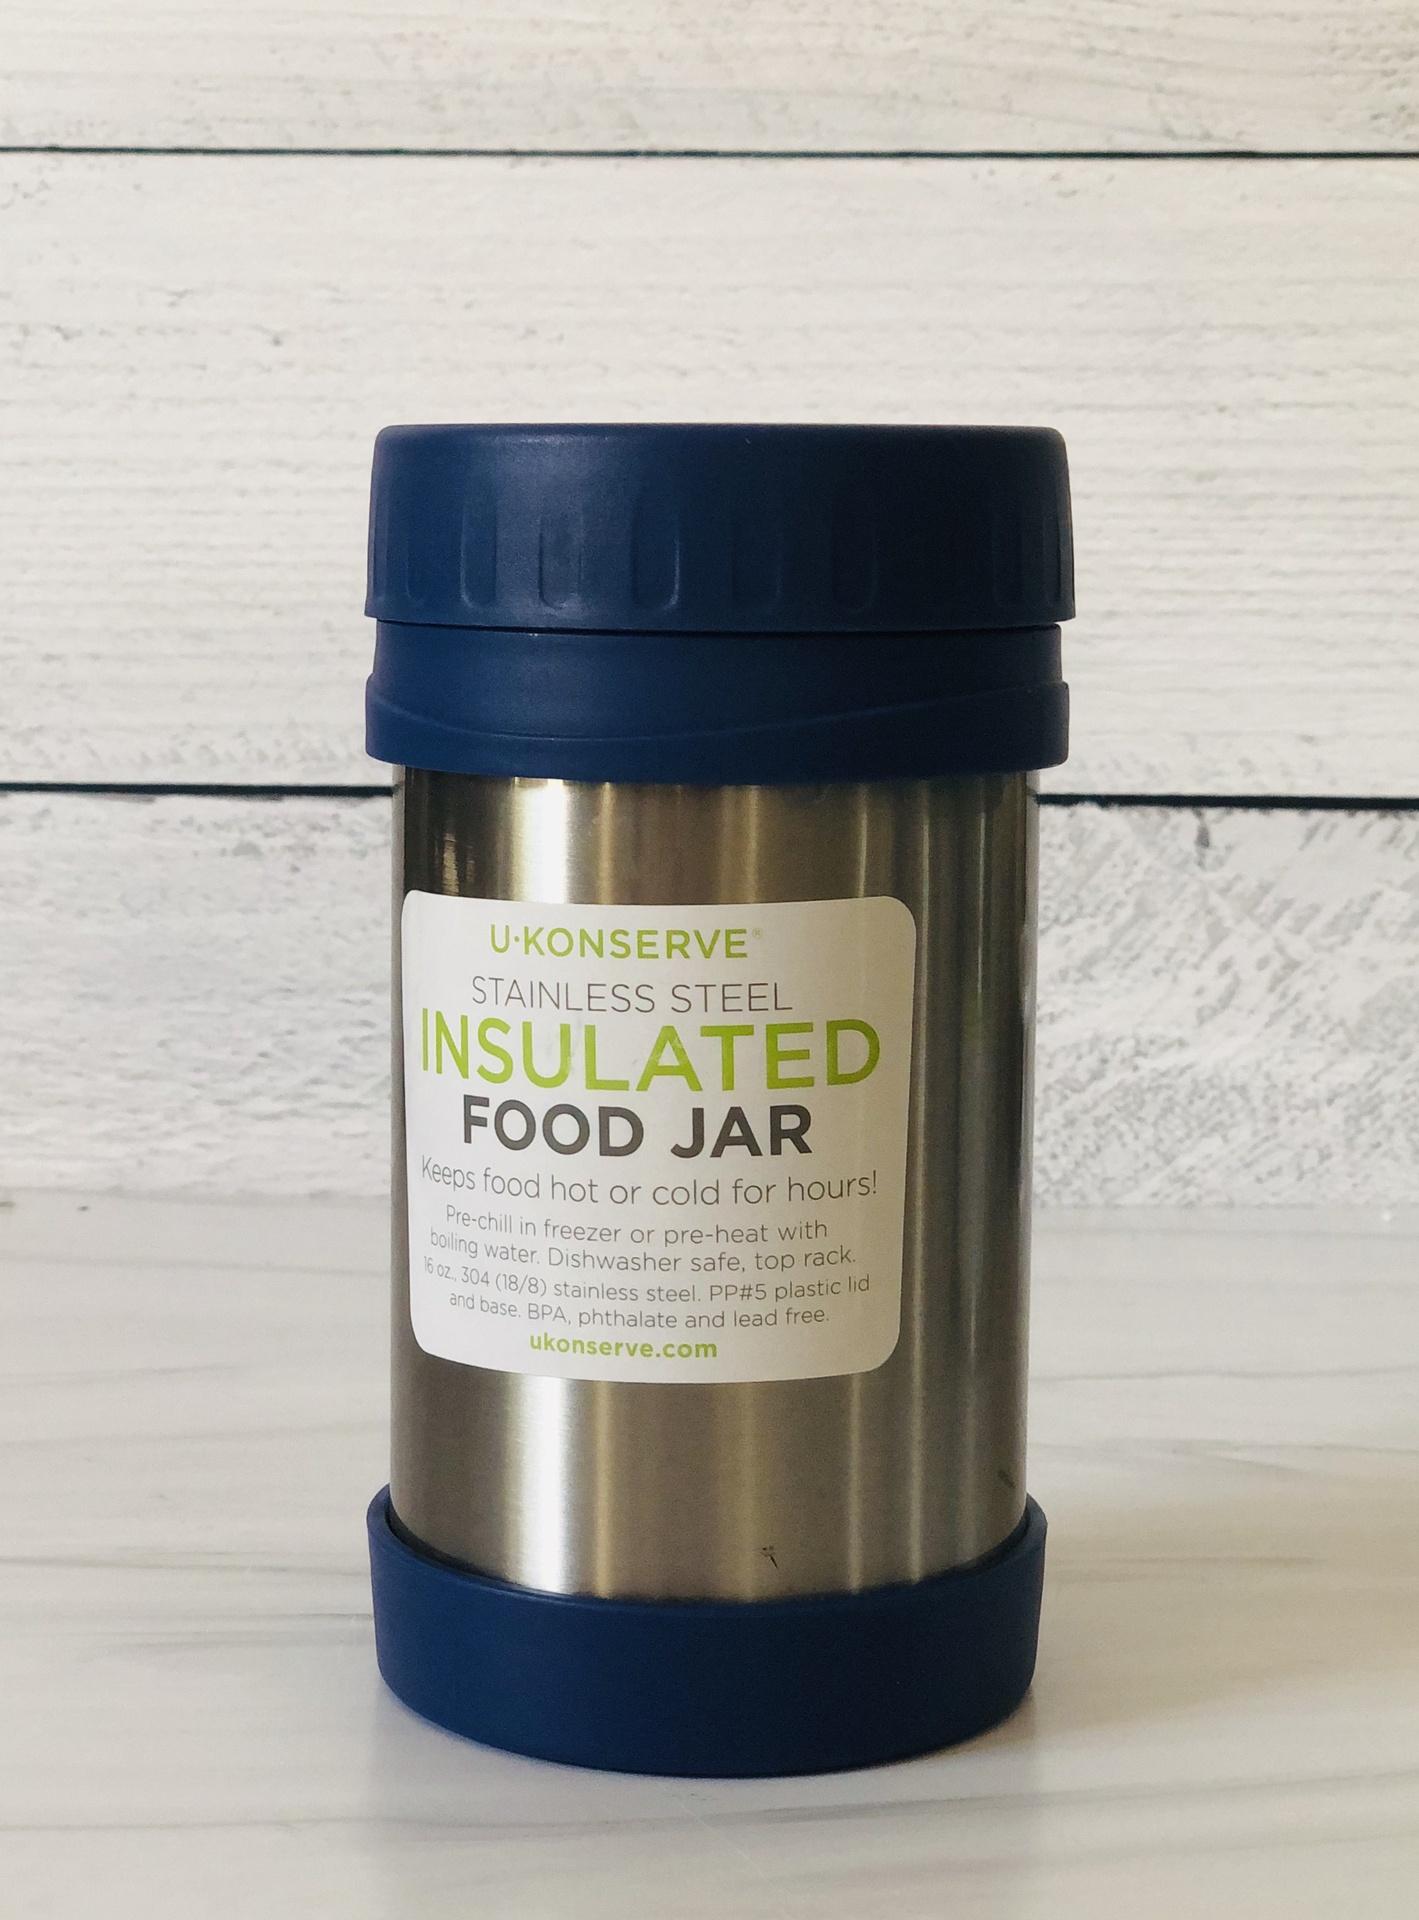 UKonserve Insulated Food Jar, 16oz